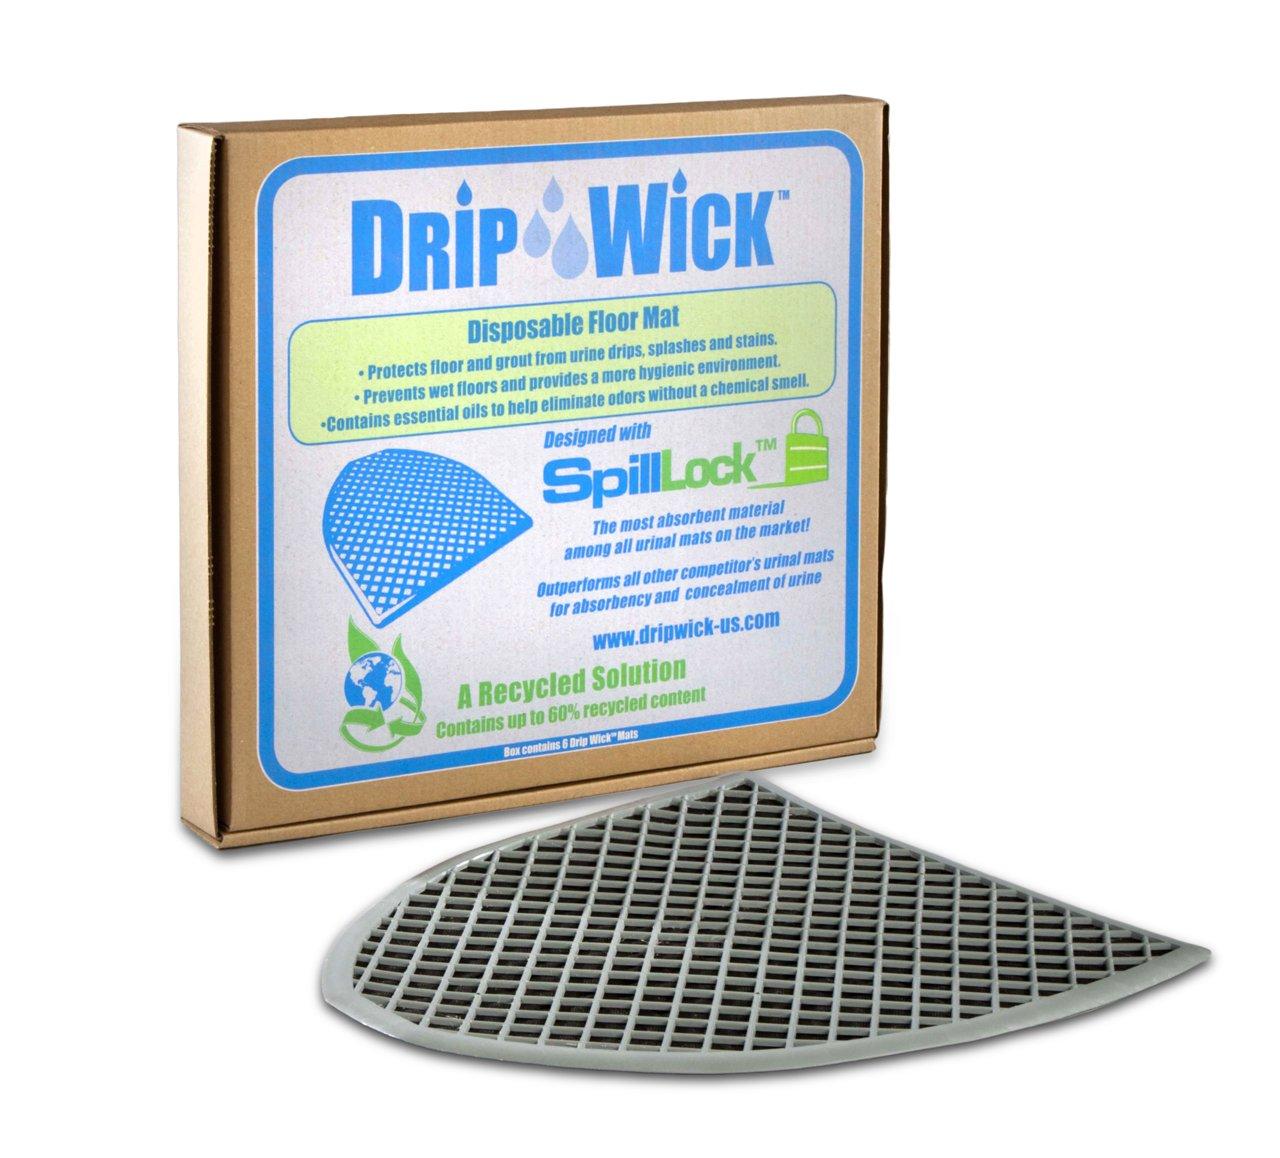 ESP DRIPB Drip-Wick Universal Disposable Absorbent Urinal Floor Mat, 20'' Length x 16'' Width, Black (Pack of 6) by ESP